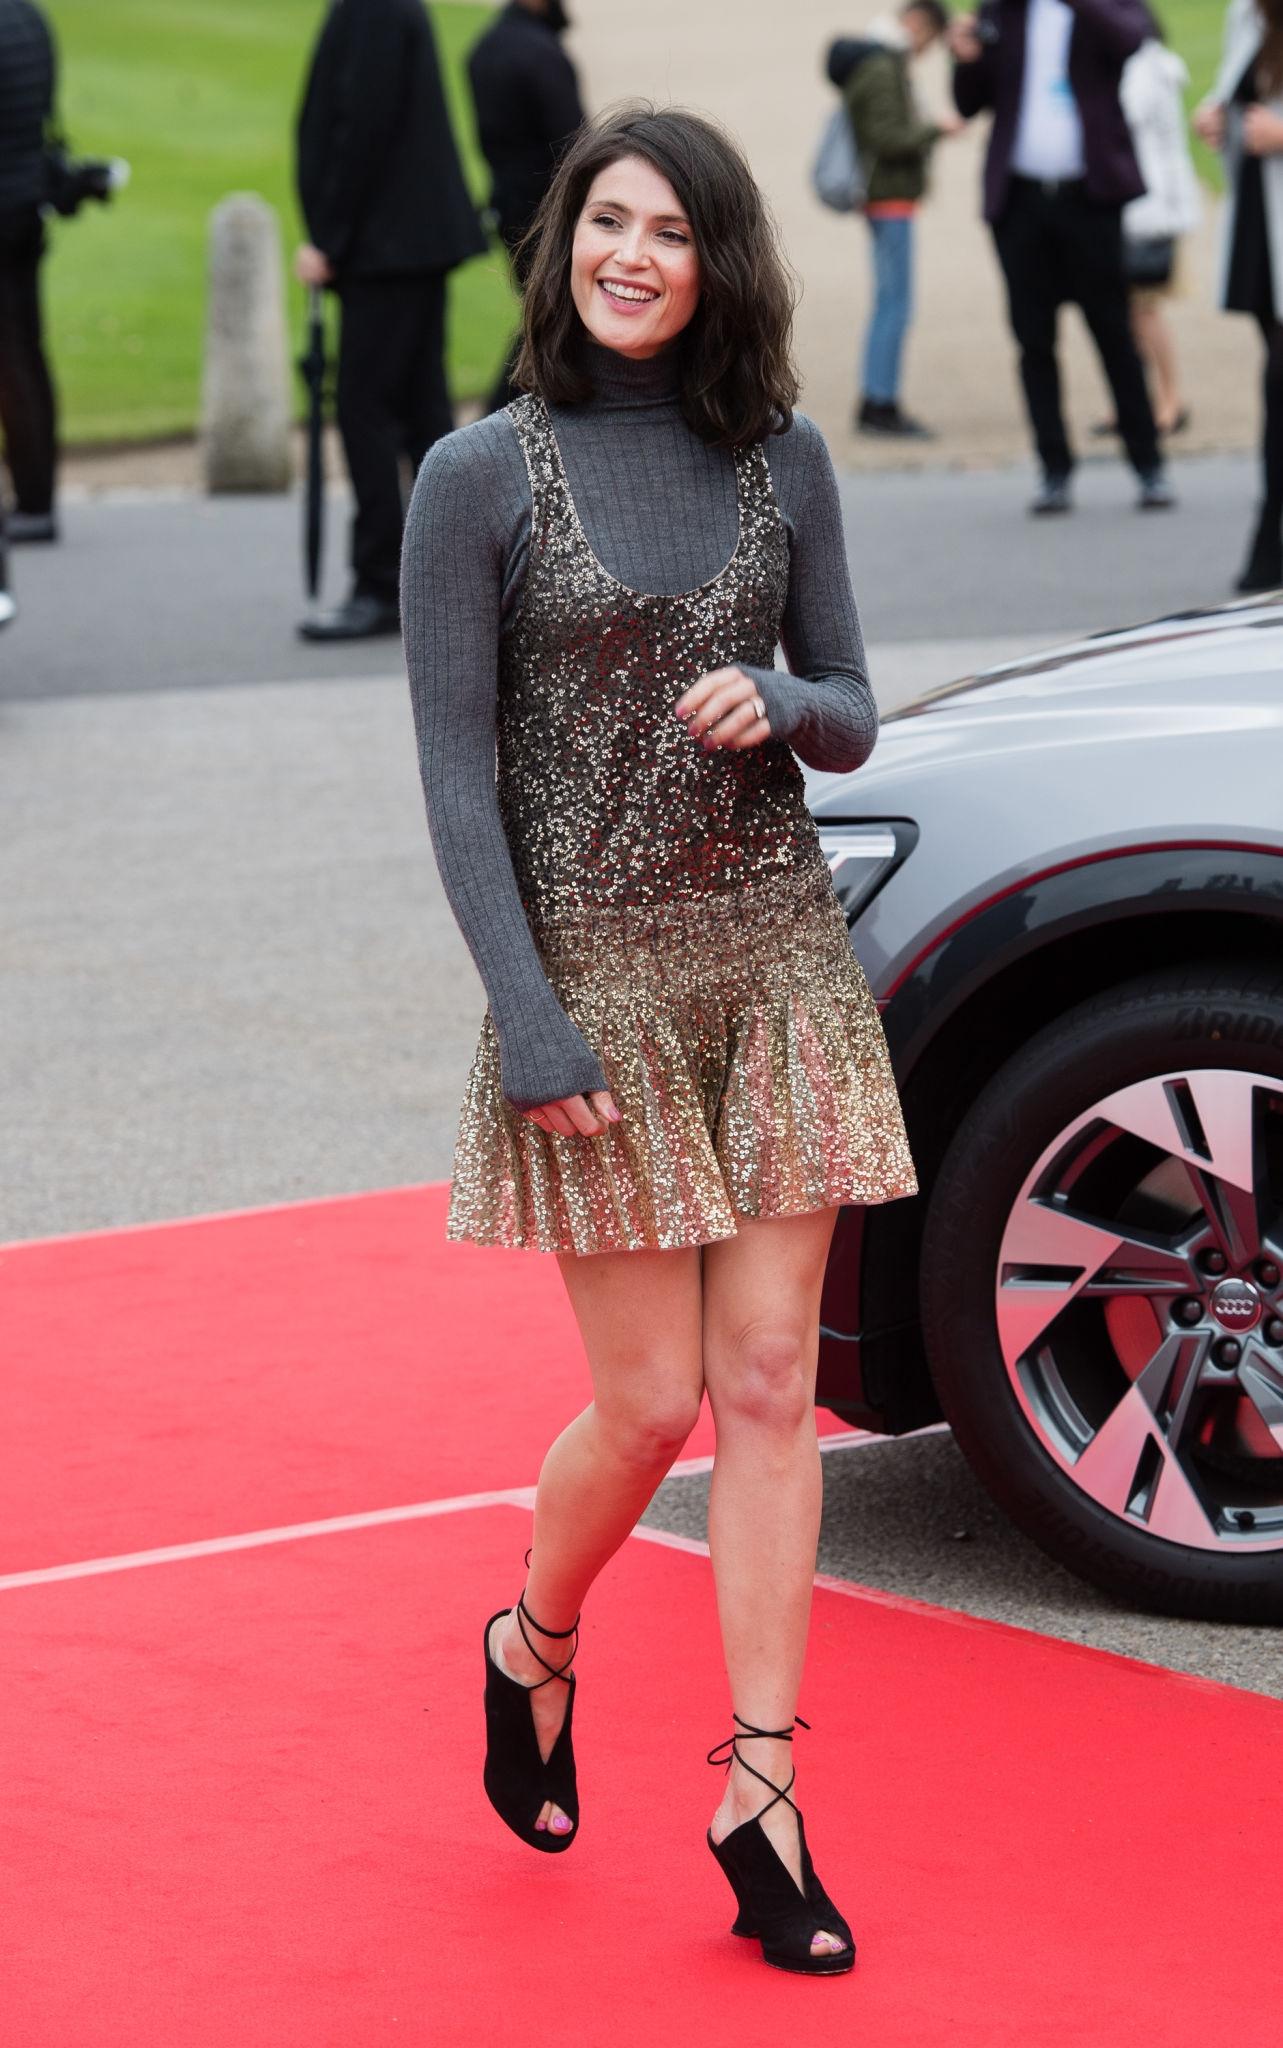 Gemma Arterton 2019 : Gemma Arterton: Red Carpet at Audi Sentebale Concert in London-17